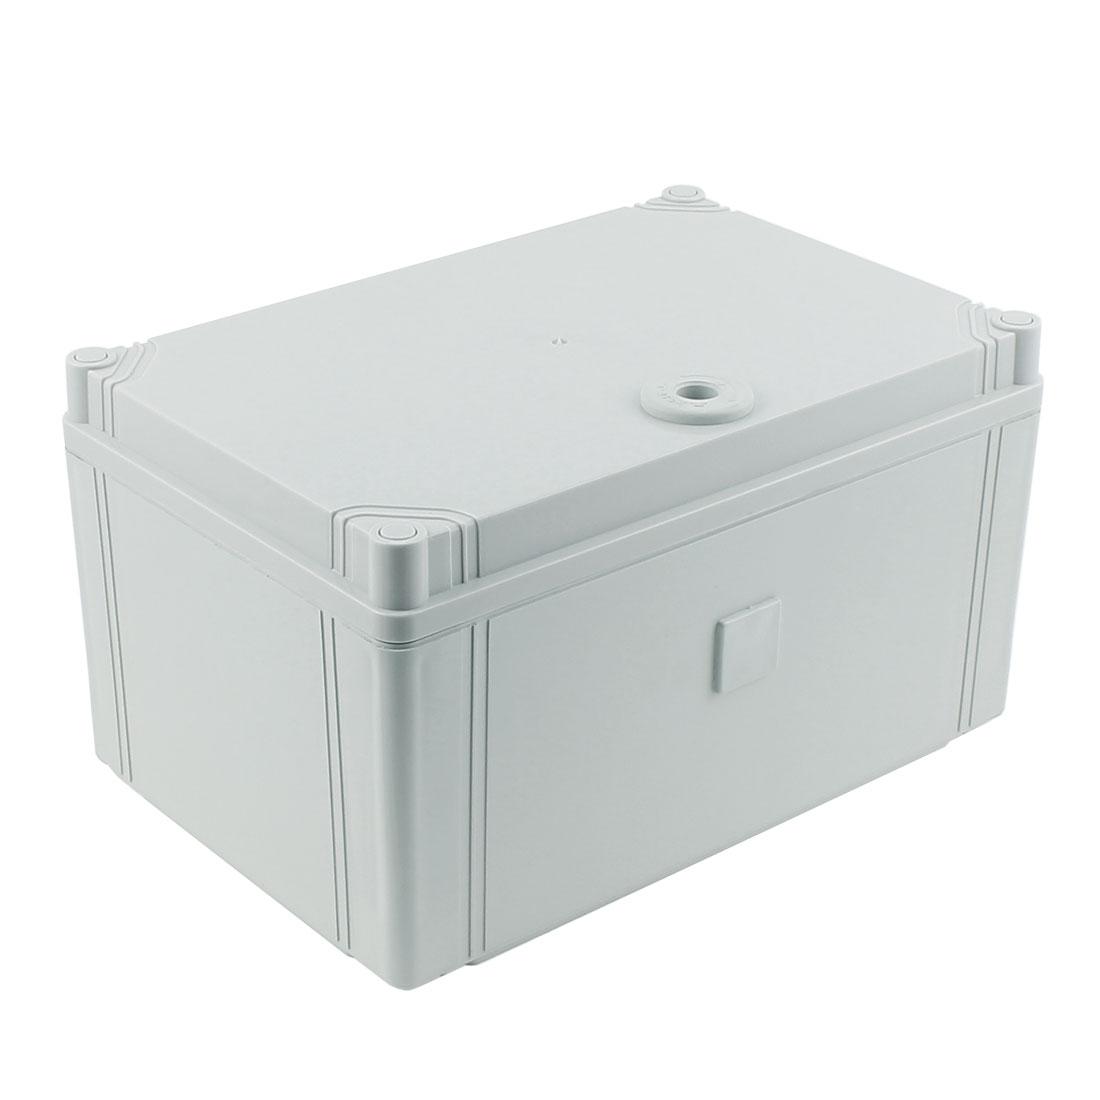 300 x 200 x 160mm Dustproof IP65 Junction Box DIY Terminal Connection Enclosure